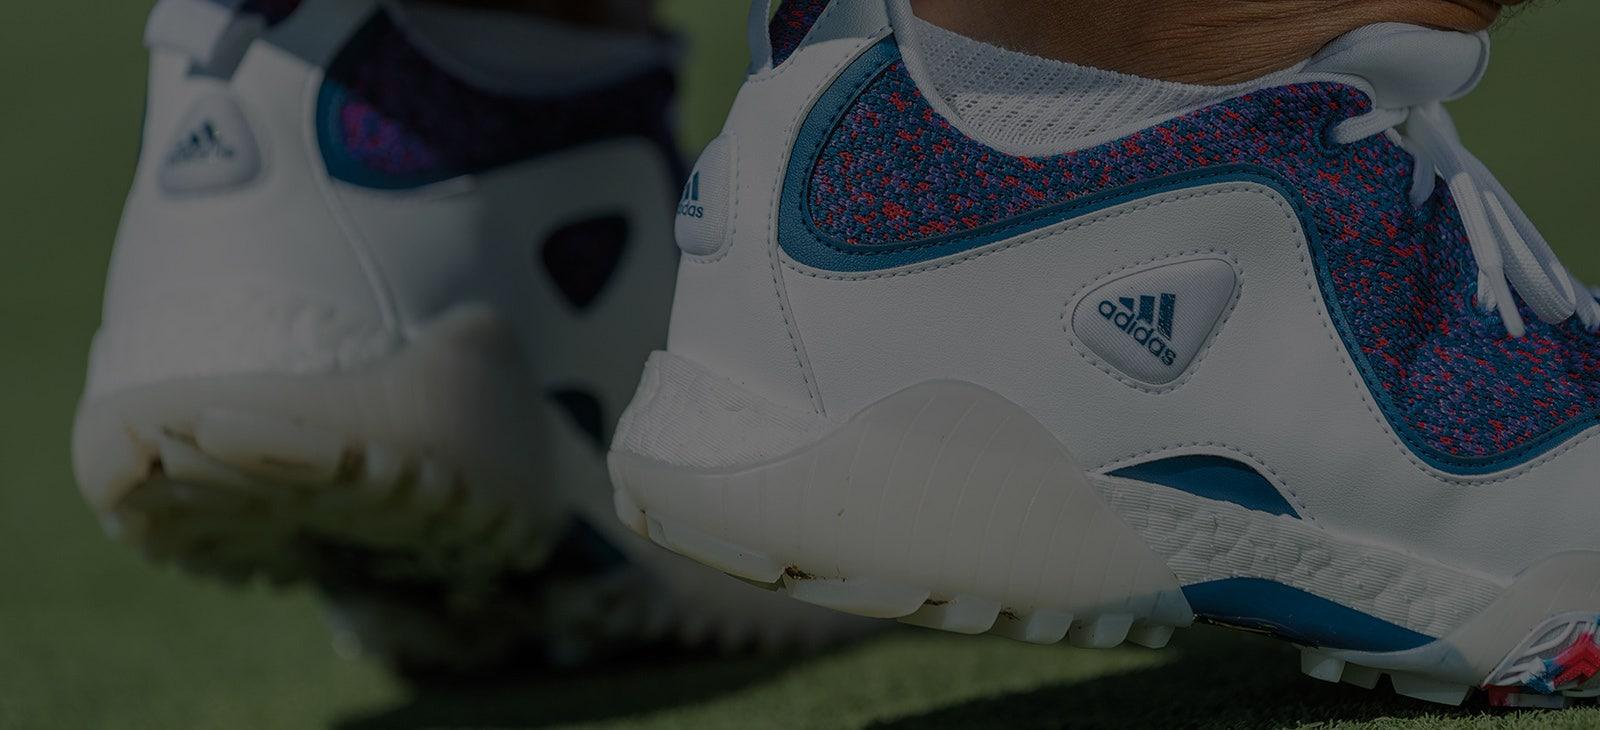 adidsa Codechaos Primeblue Golf Shoes